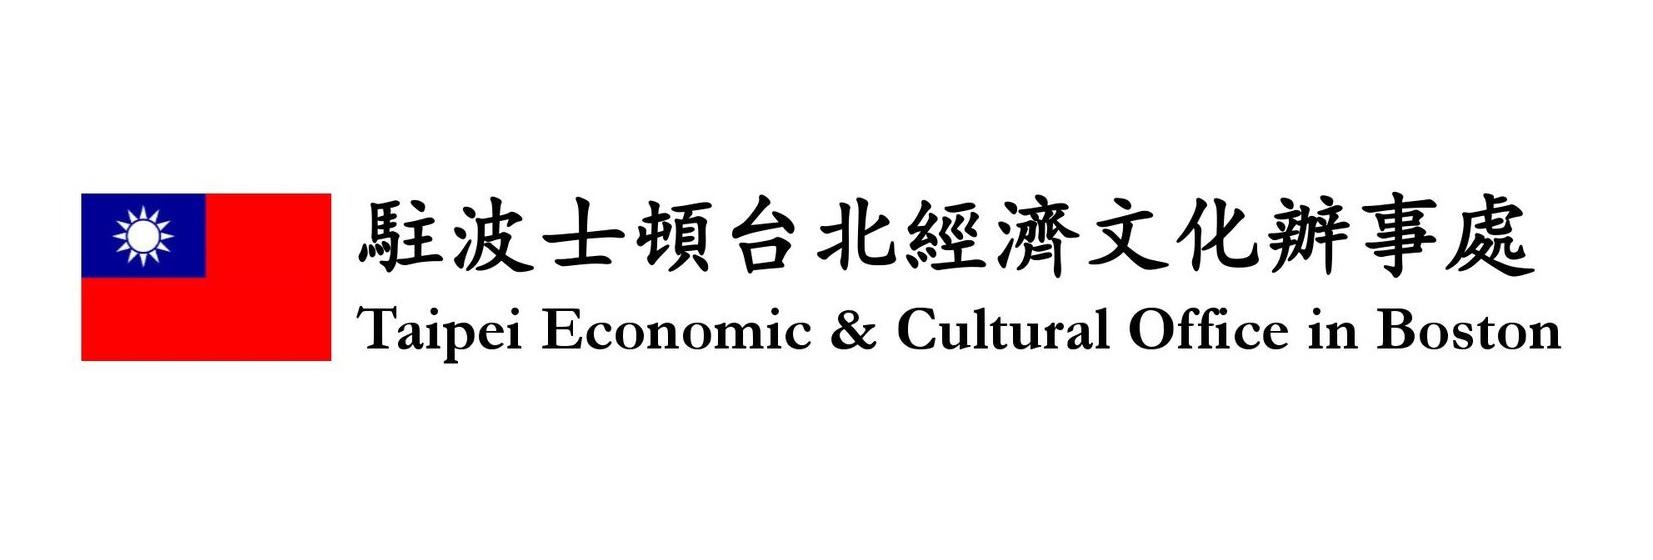 TECO_Logo.jpg